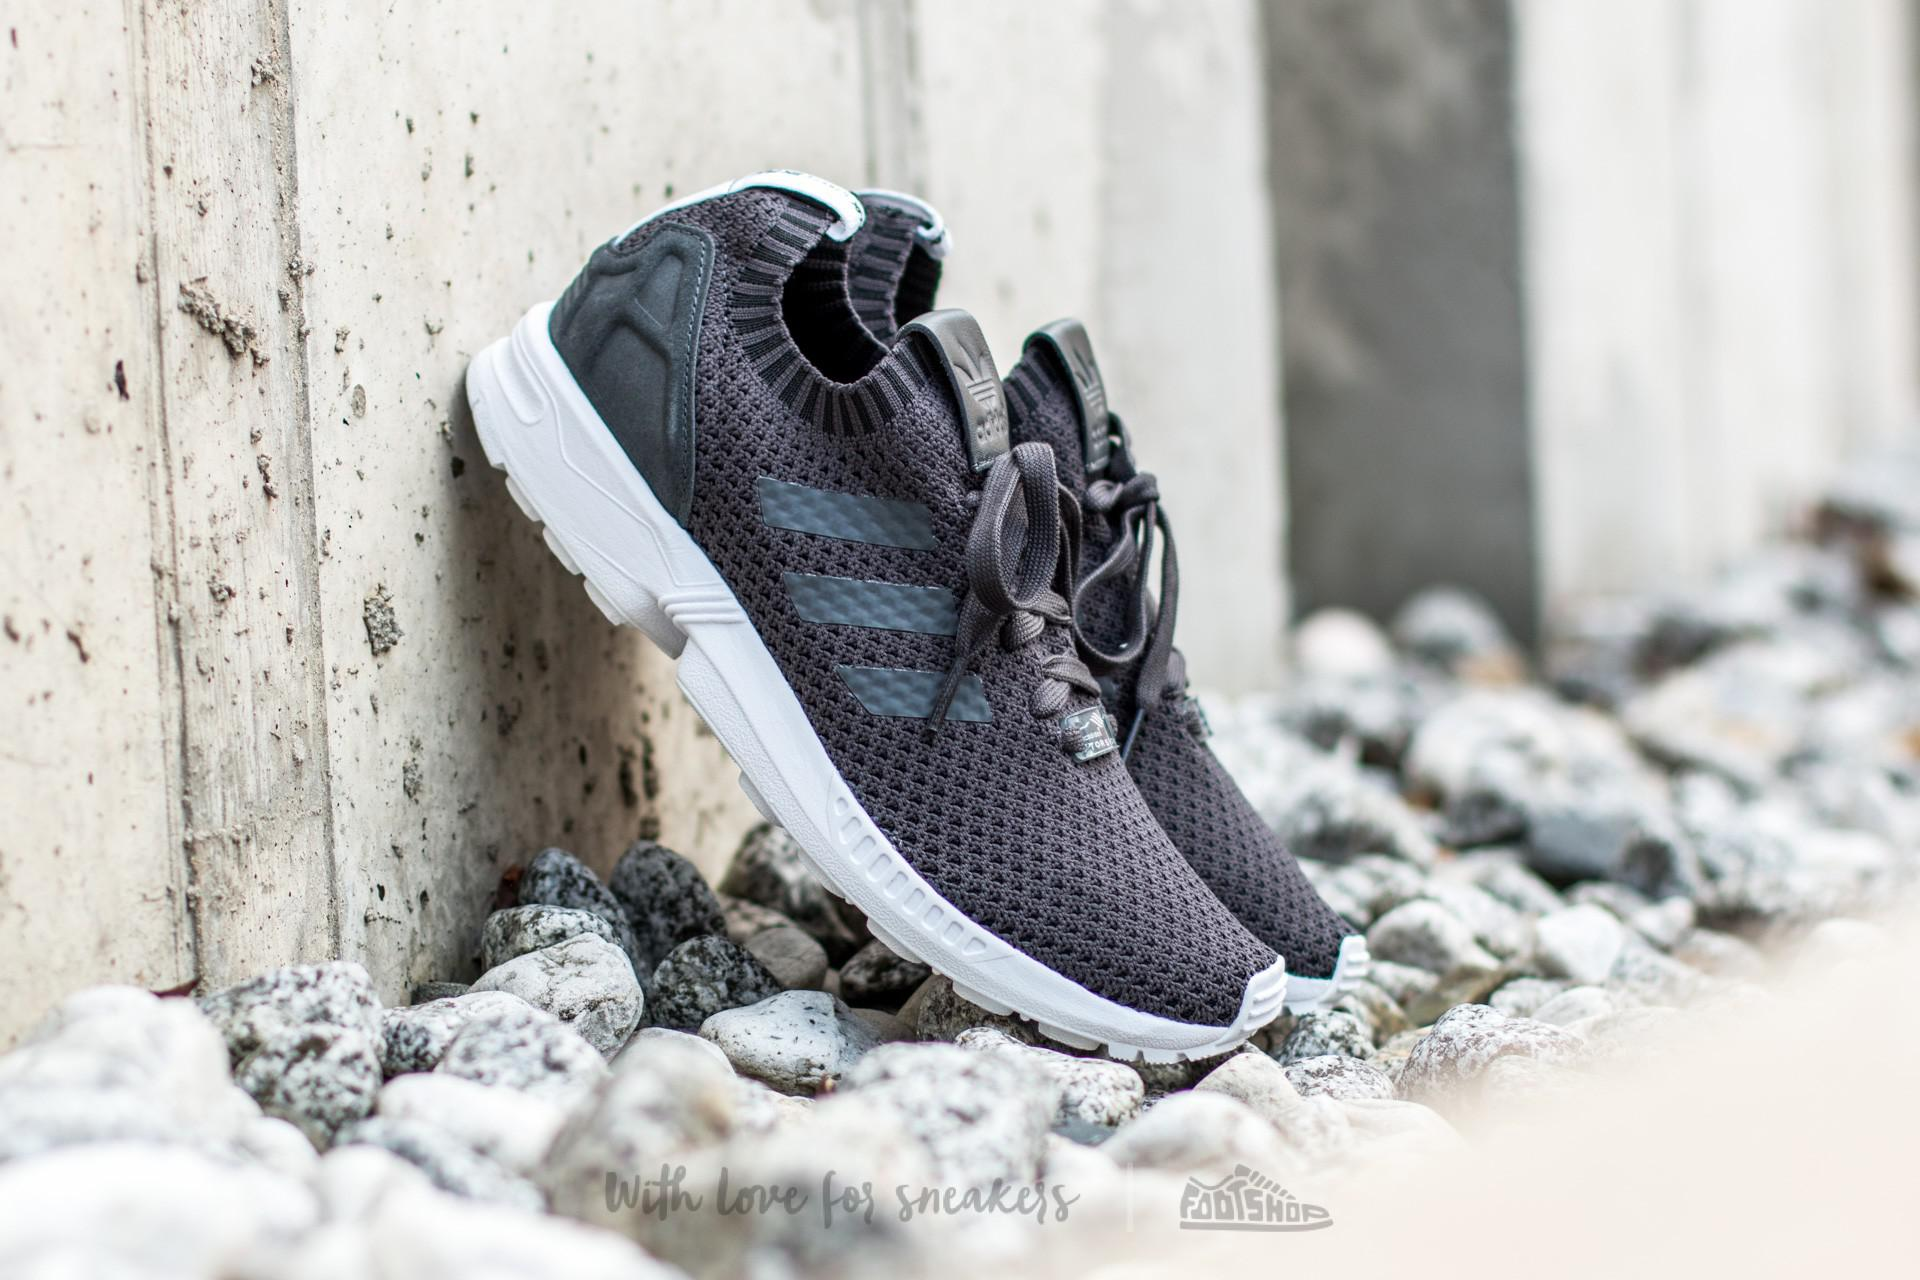 cb6b731be0afd Lyst - adidas Originals Adidas Zx Flux Primeknit Dgh Solid Grey  Dgh ...